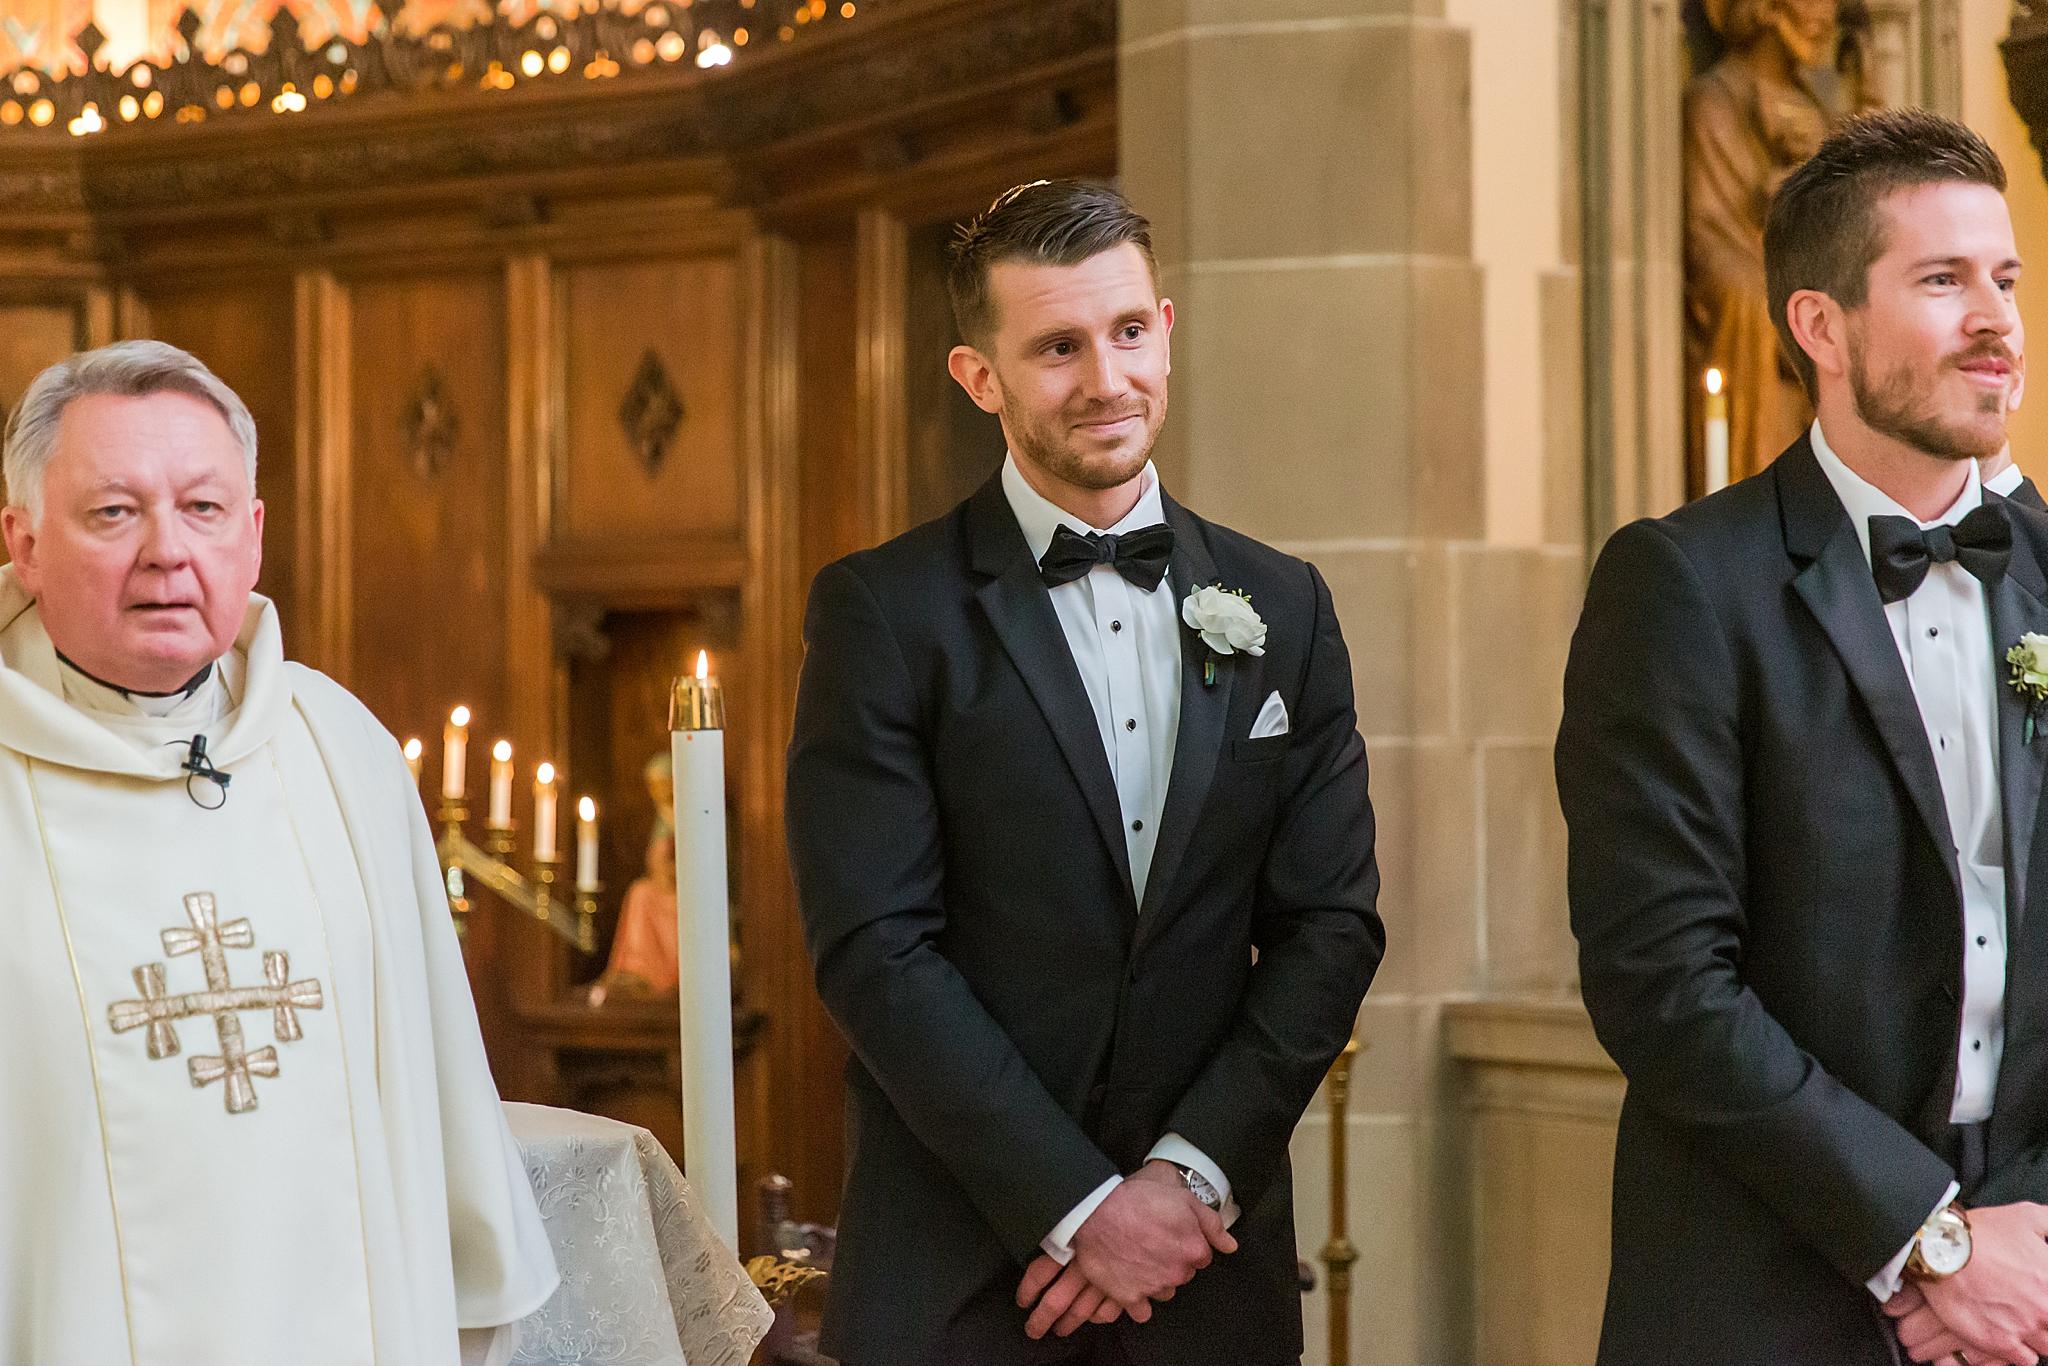 detroit-wedding-photographer-grosse-pointe-academy-chapel-detroit-golf-club-wedding-carly-matt-by-courtney-carolyn-photography_0028.jpg